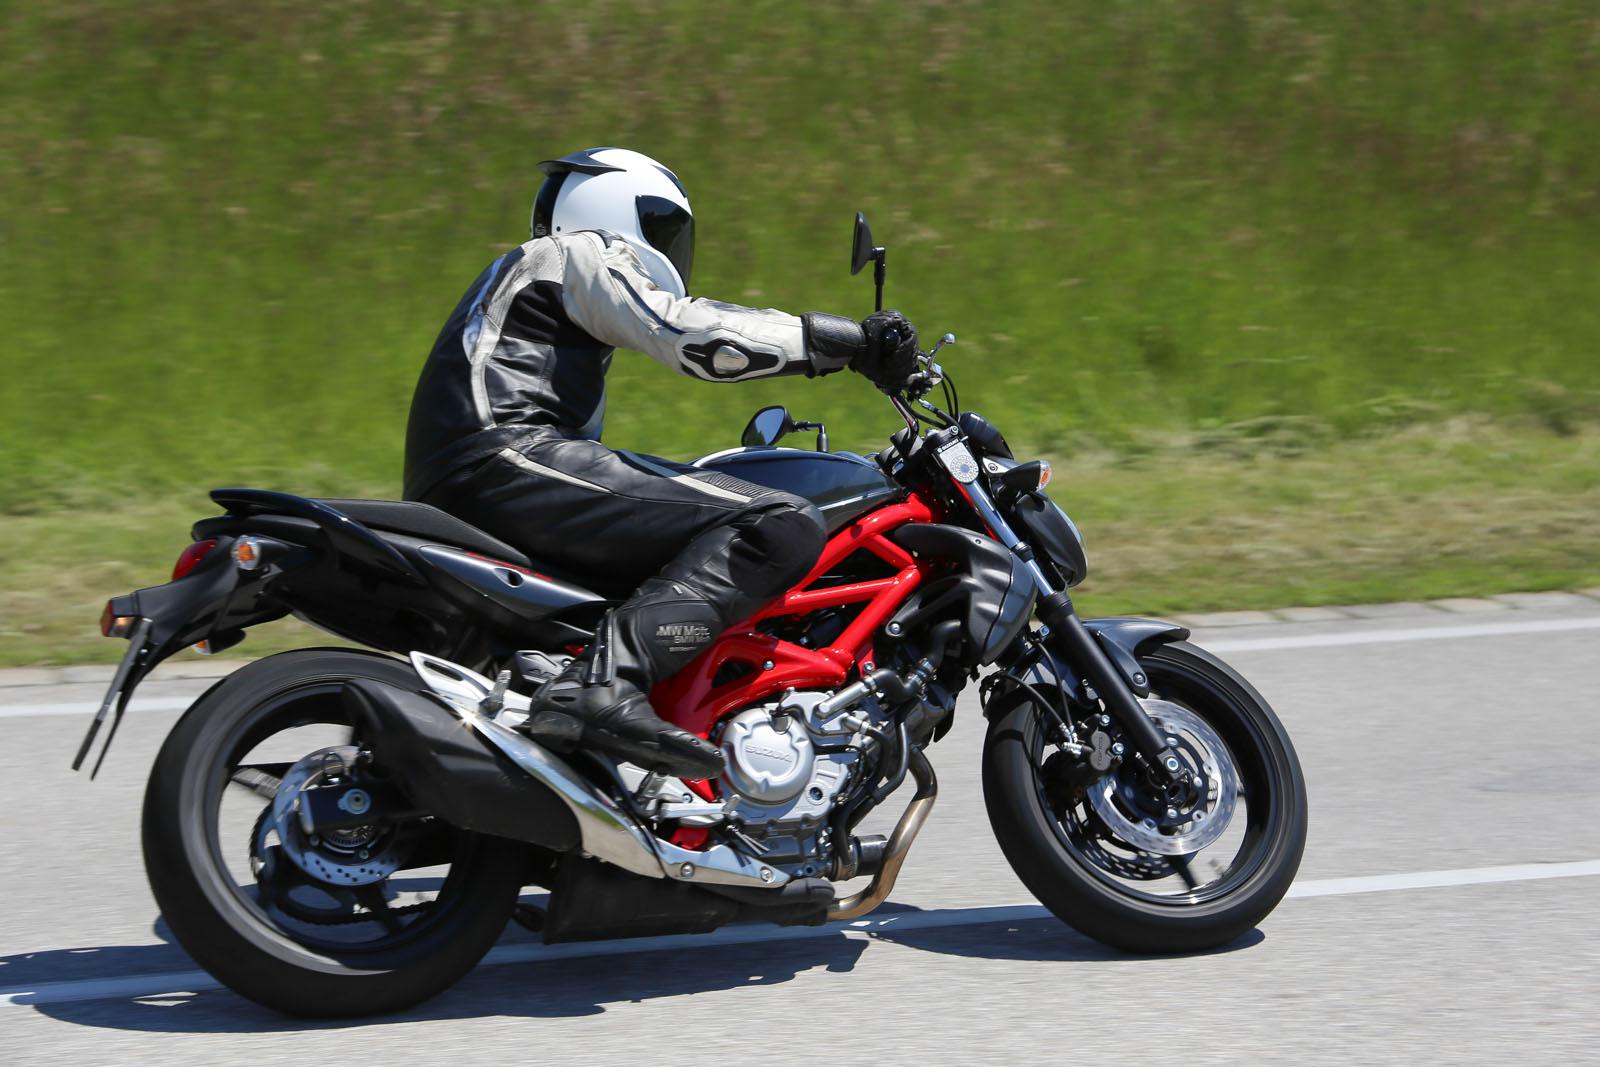 http://www.motorrad-bilder.at/slideshows/291/011178/NakedbikeTestAuswahl8.jpg